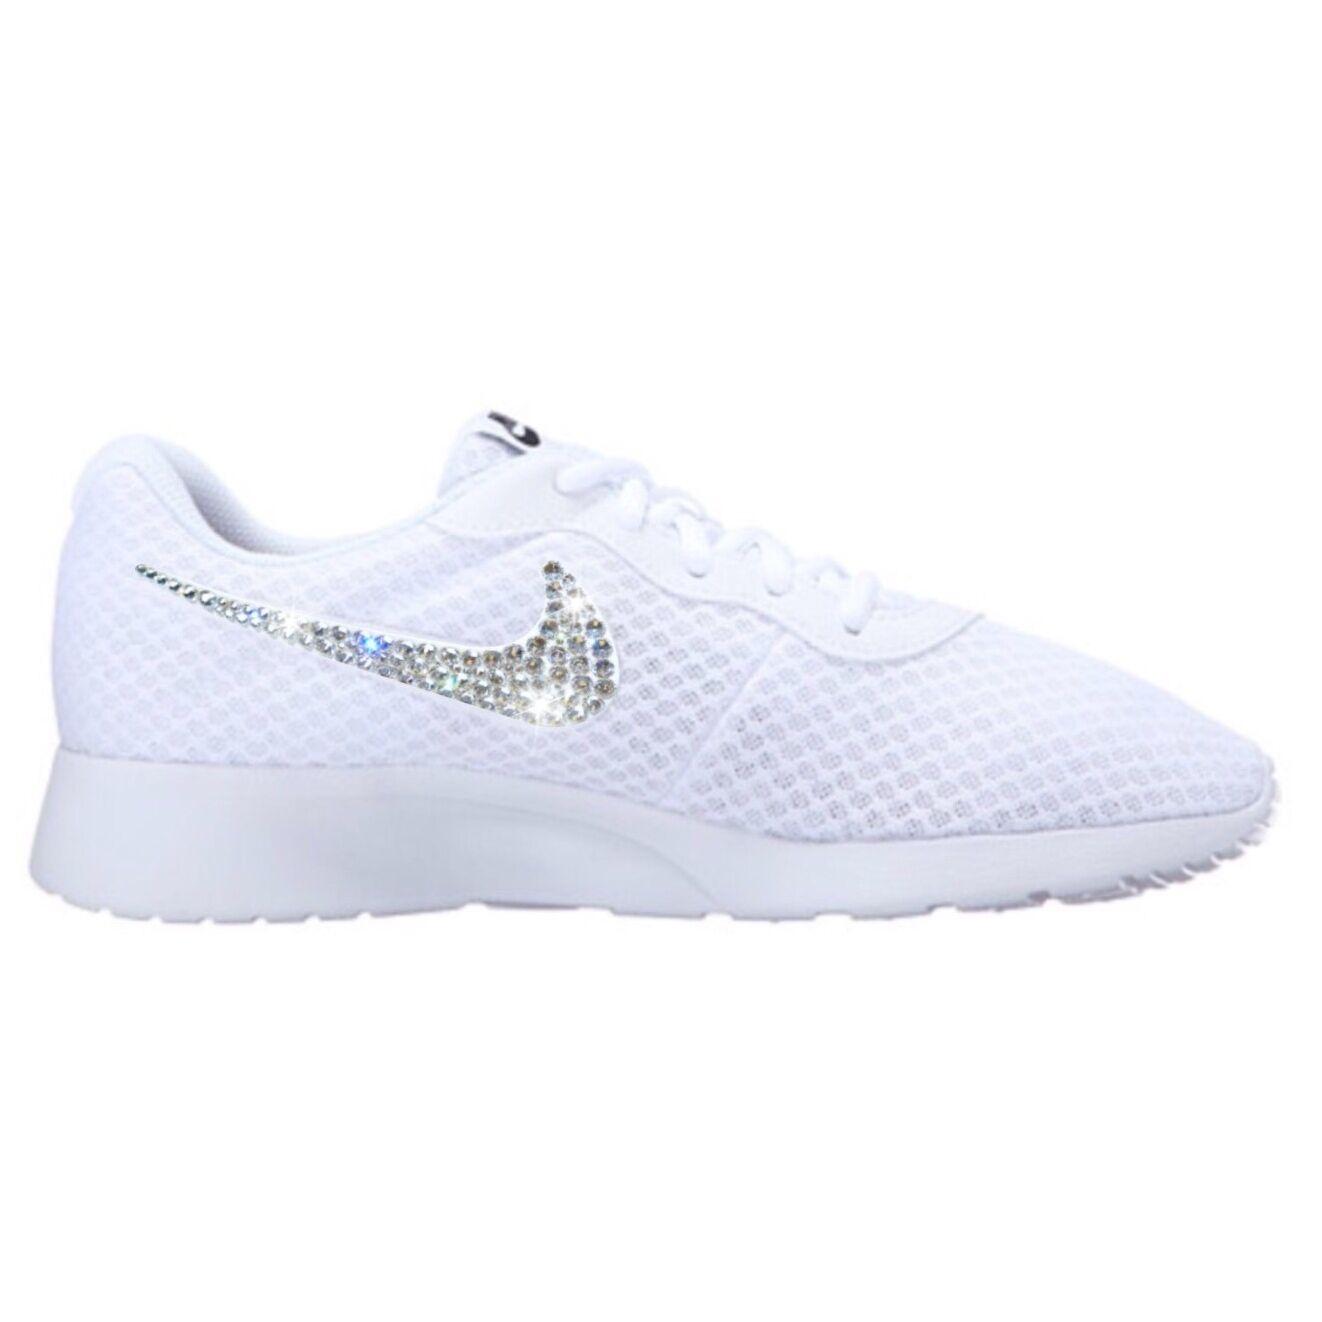 Bling Nike Tanjun shoes with Swarovski Crystal Diamond Rhinestone - White